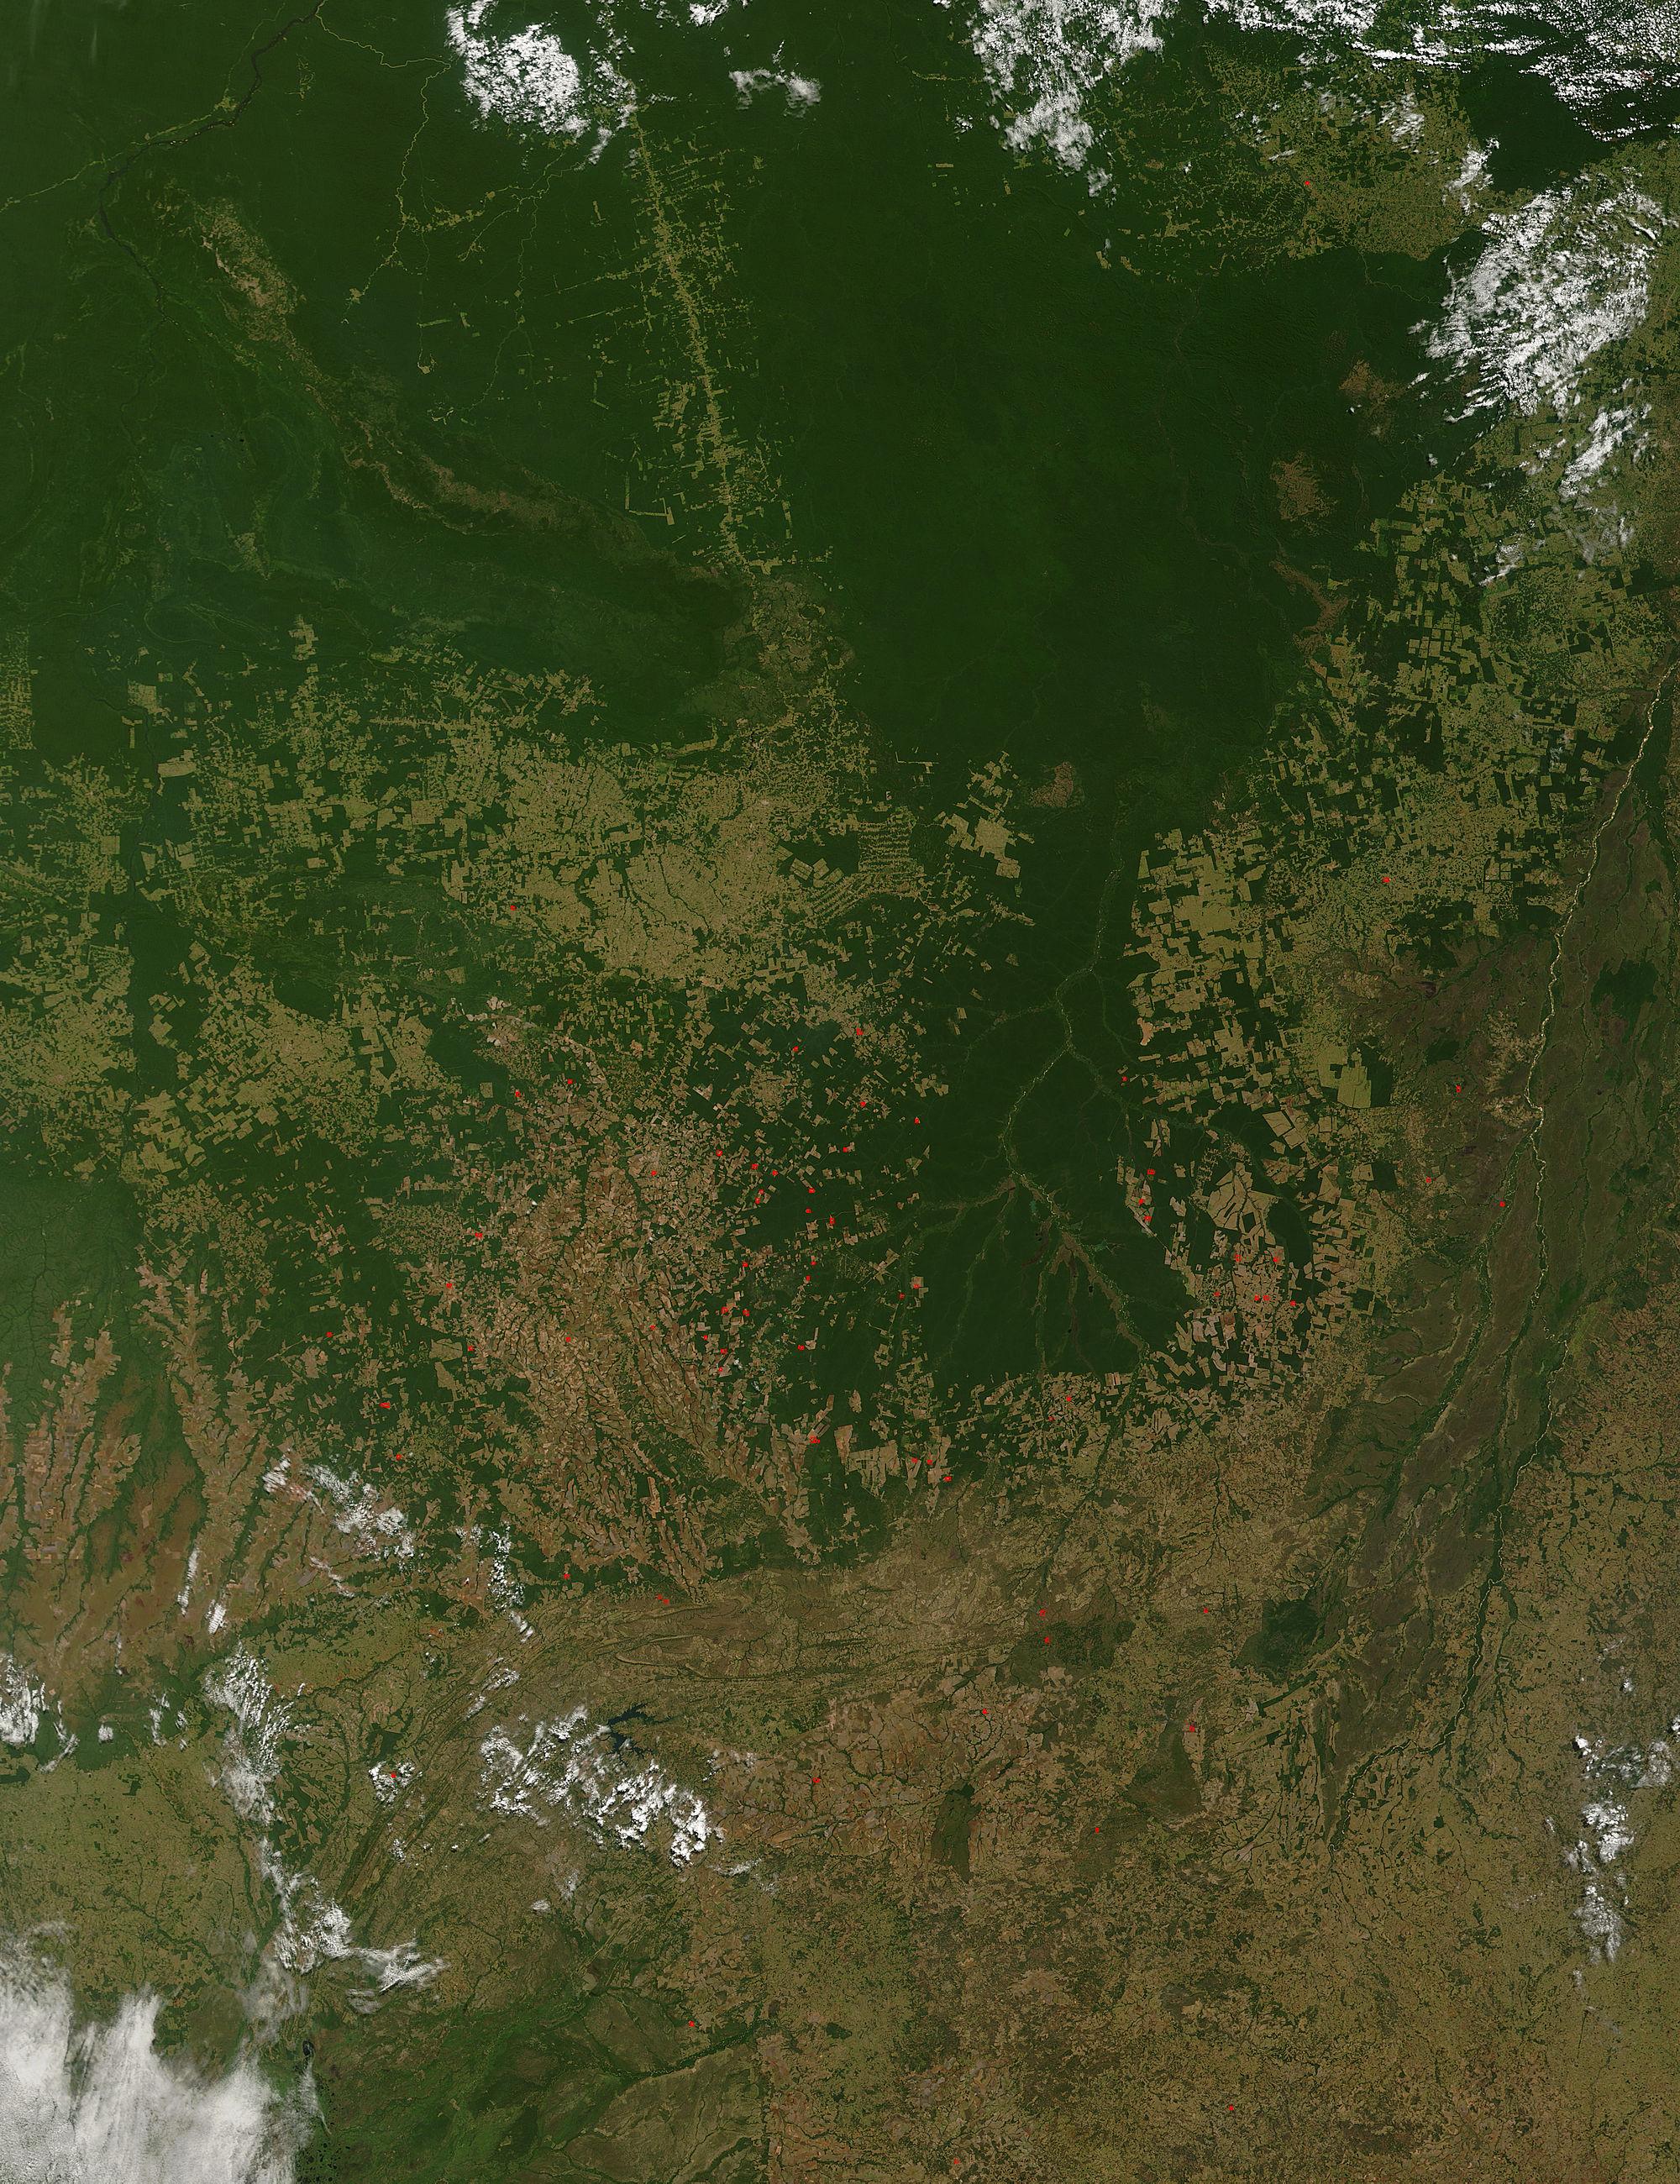 Deforestation in Mato Grasso, Brazil - related image preview